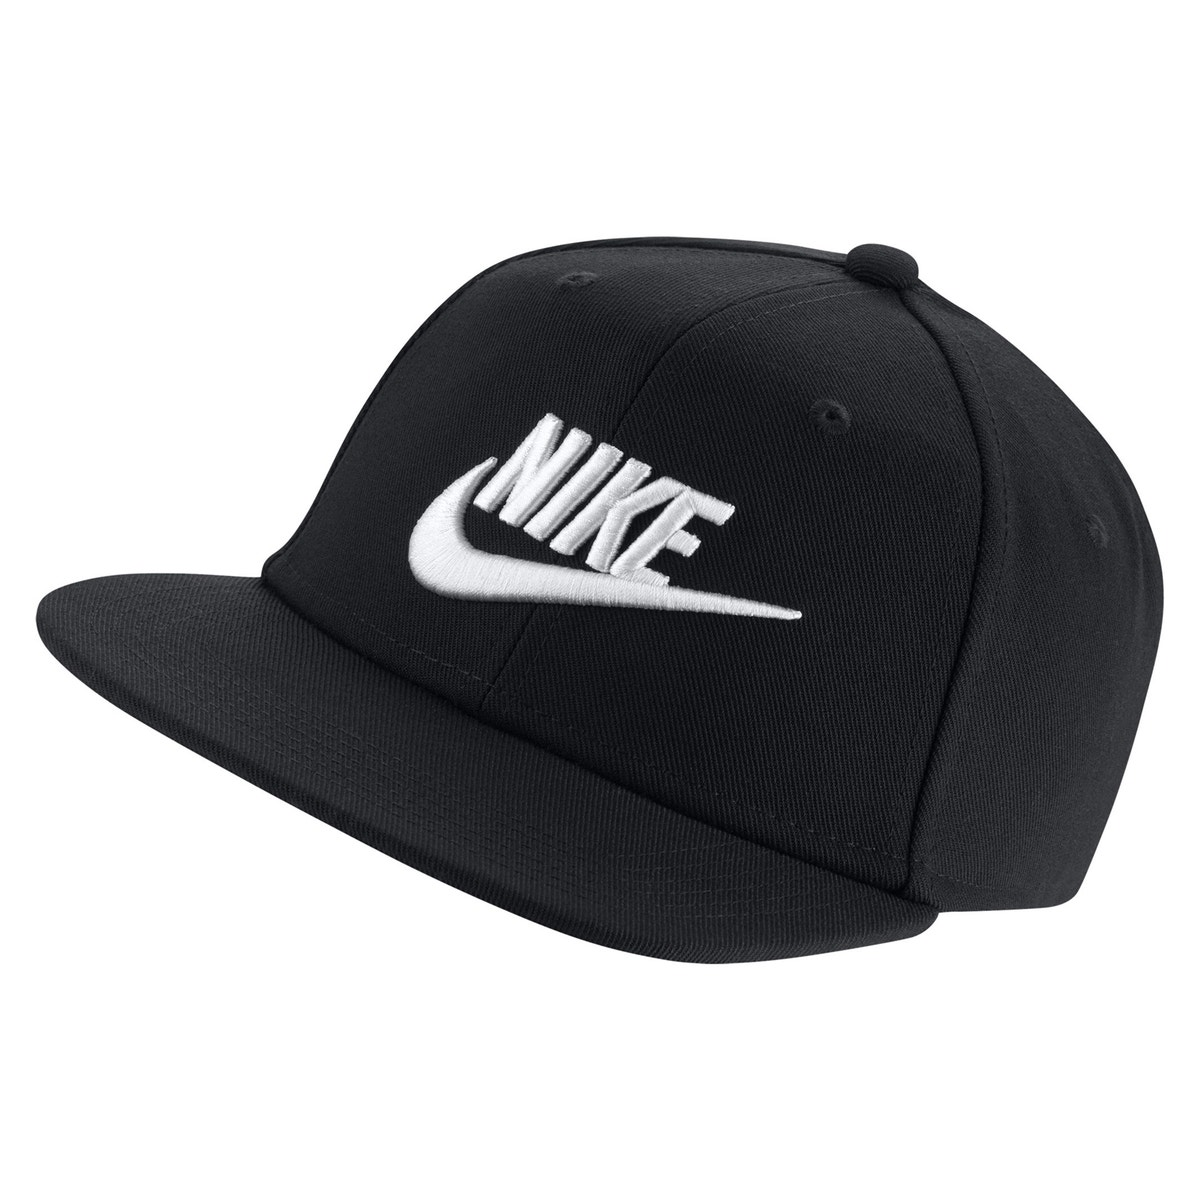 Nike - Καπέλο, Futura 4 350180405 - 6527